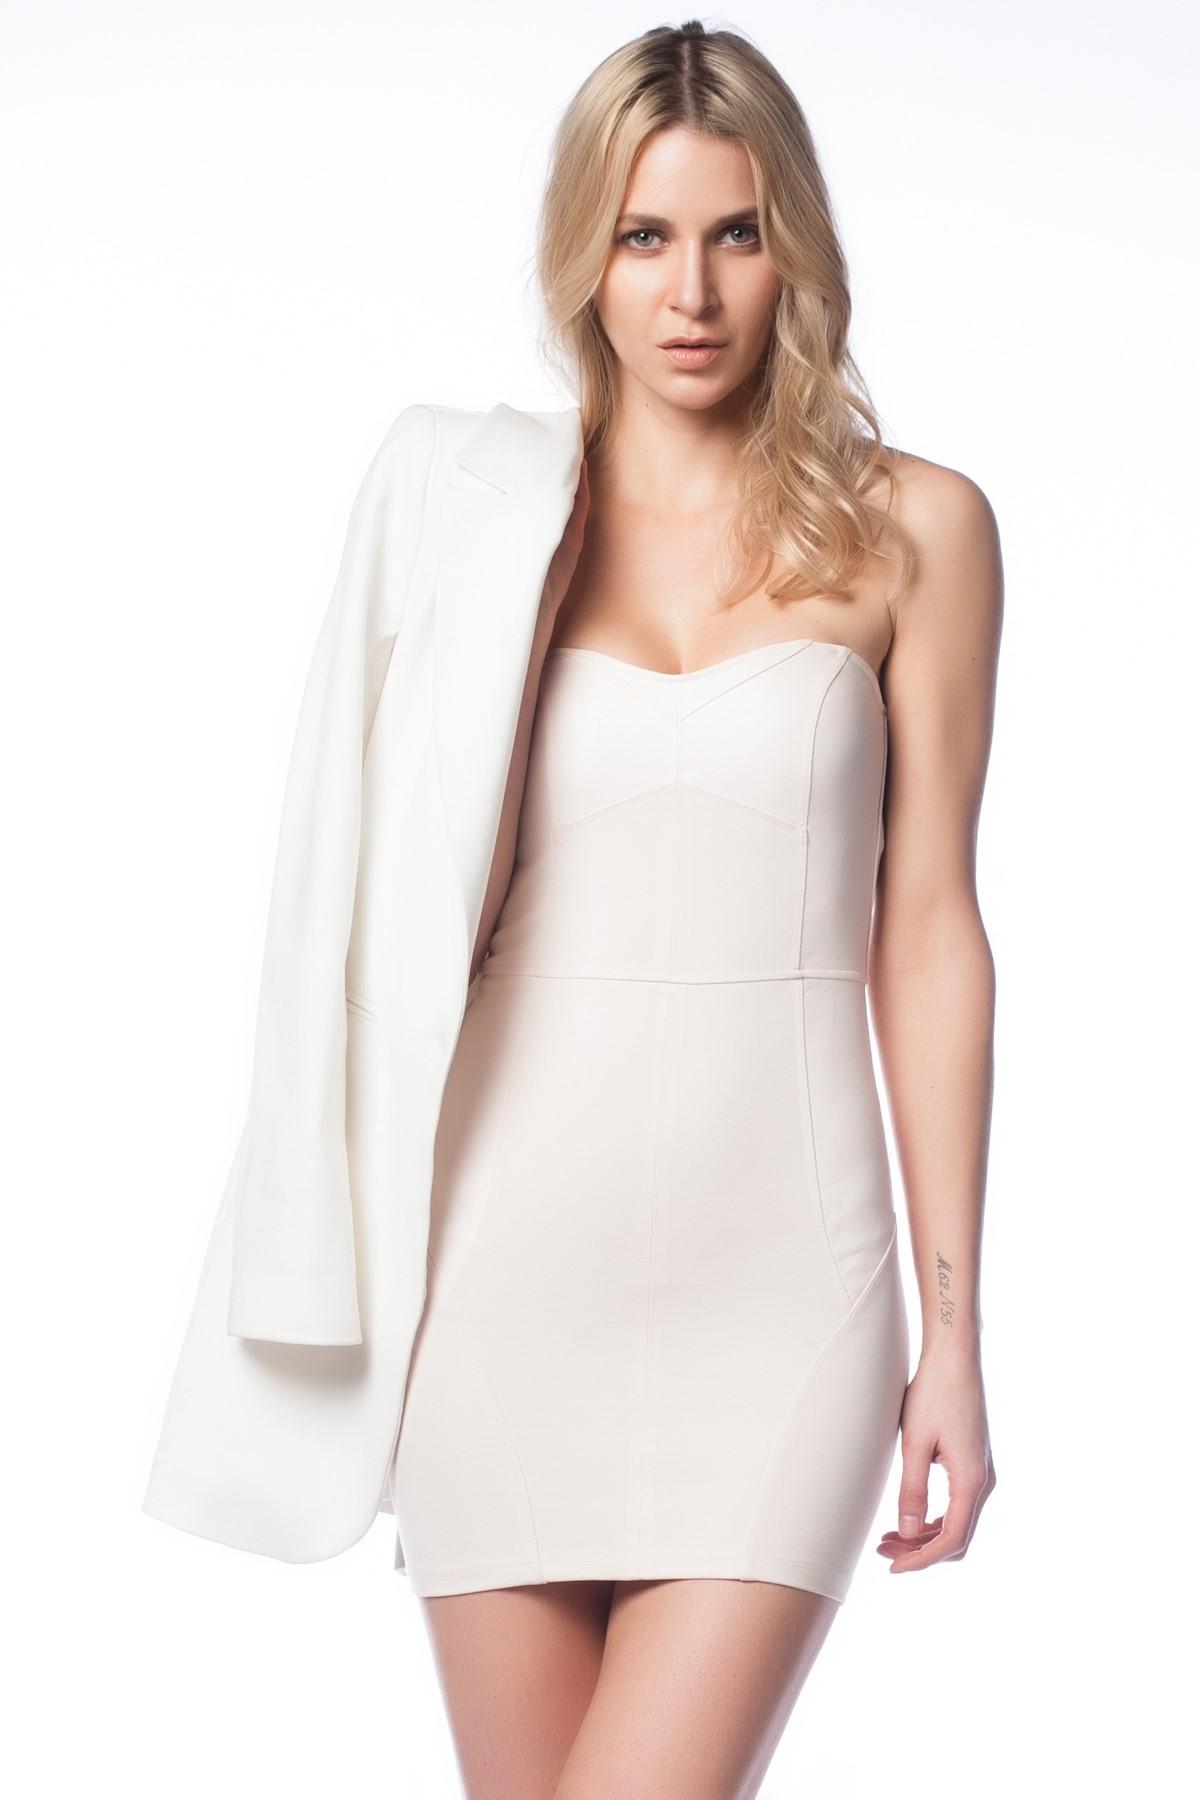 Straplez Elbise Jimmy Key Yeni Sezon Modelleri